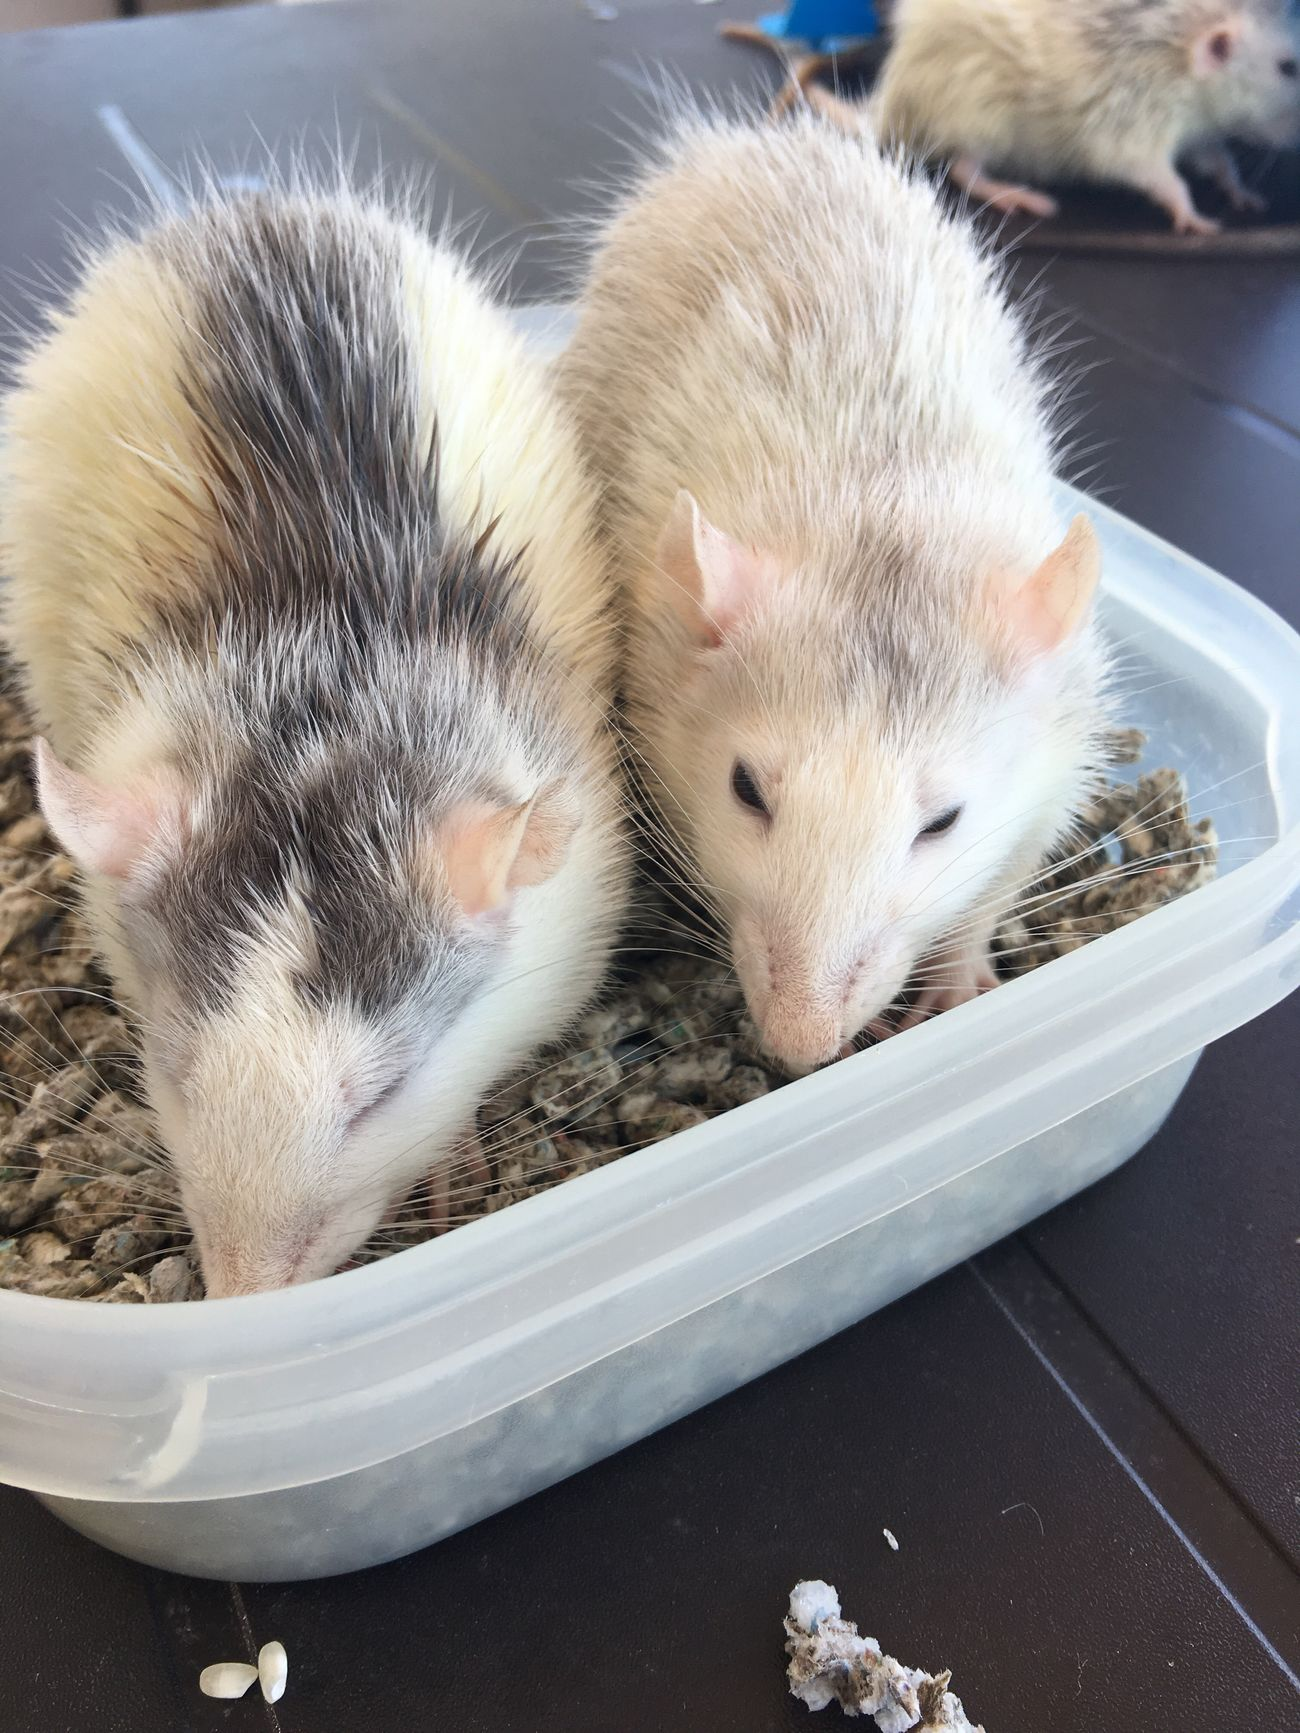 Que sueño!! Jaja Sueño Dormir Rat Animal Cute Rats Avy Loverats Rim Avy And Rim